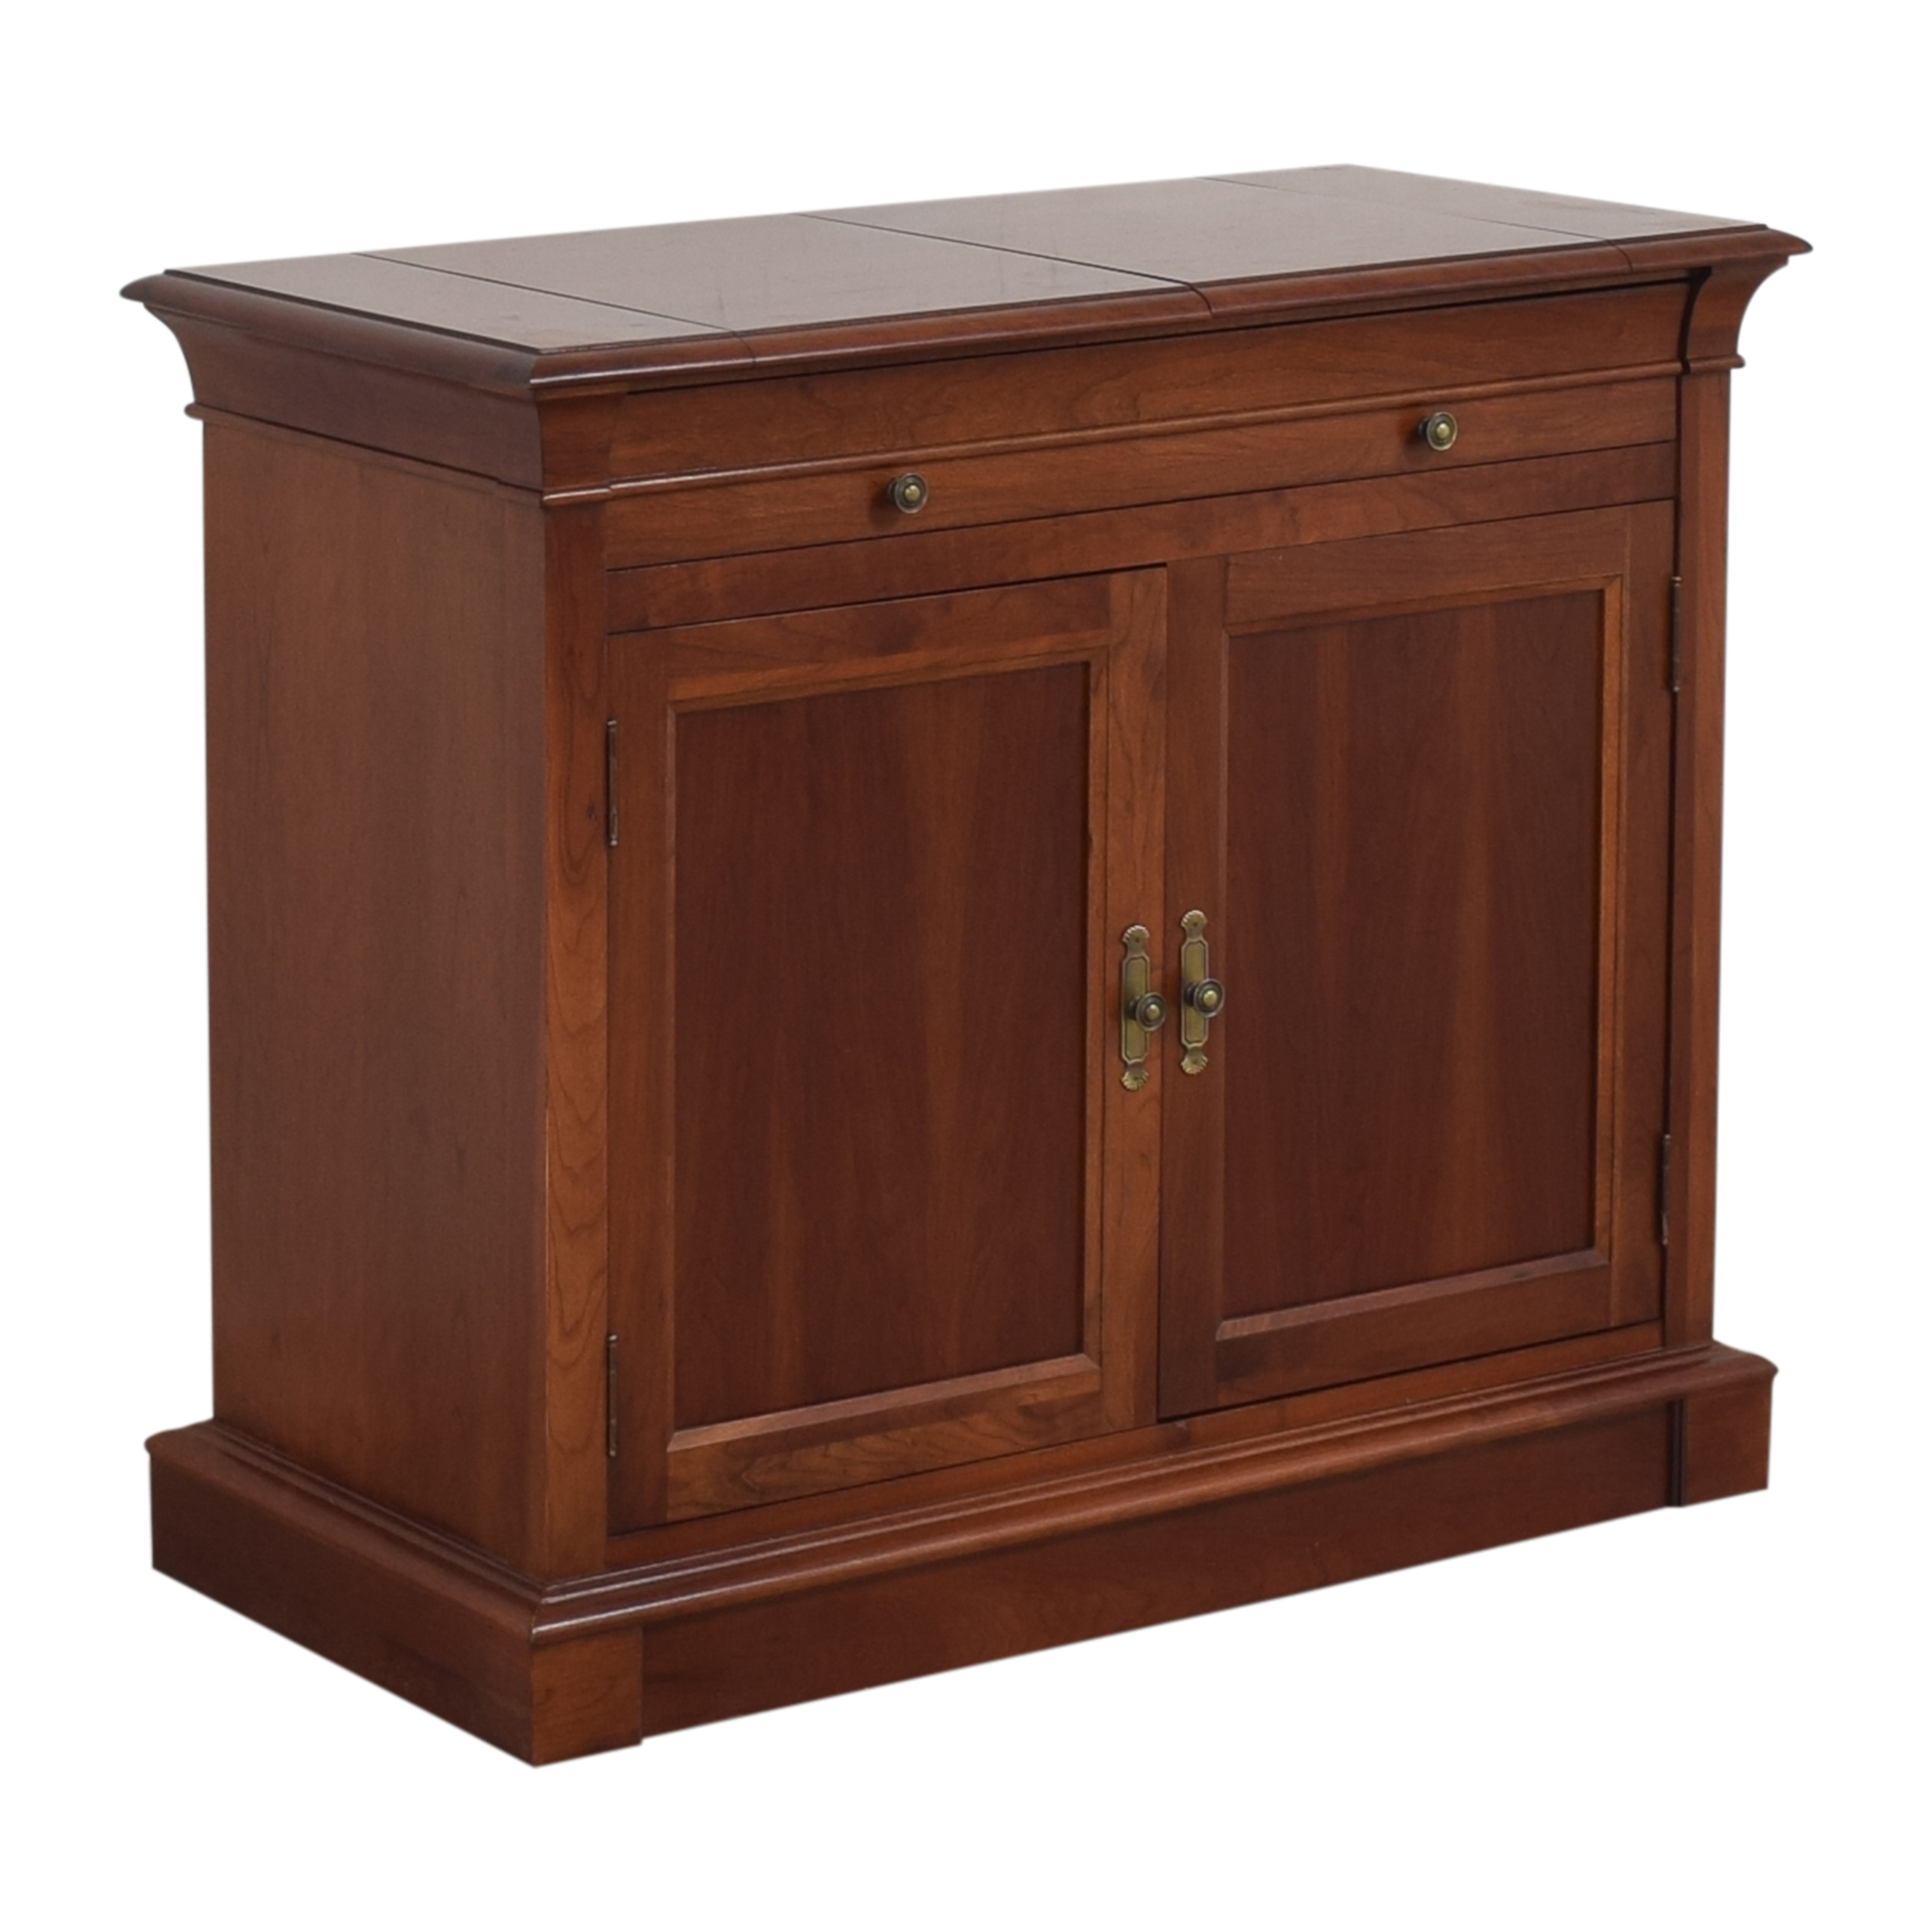 buy Ethan Allen Medallion Flip Top Buffet Cabinet Ethan Allen Cabinets & Sideboards